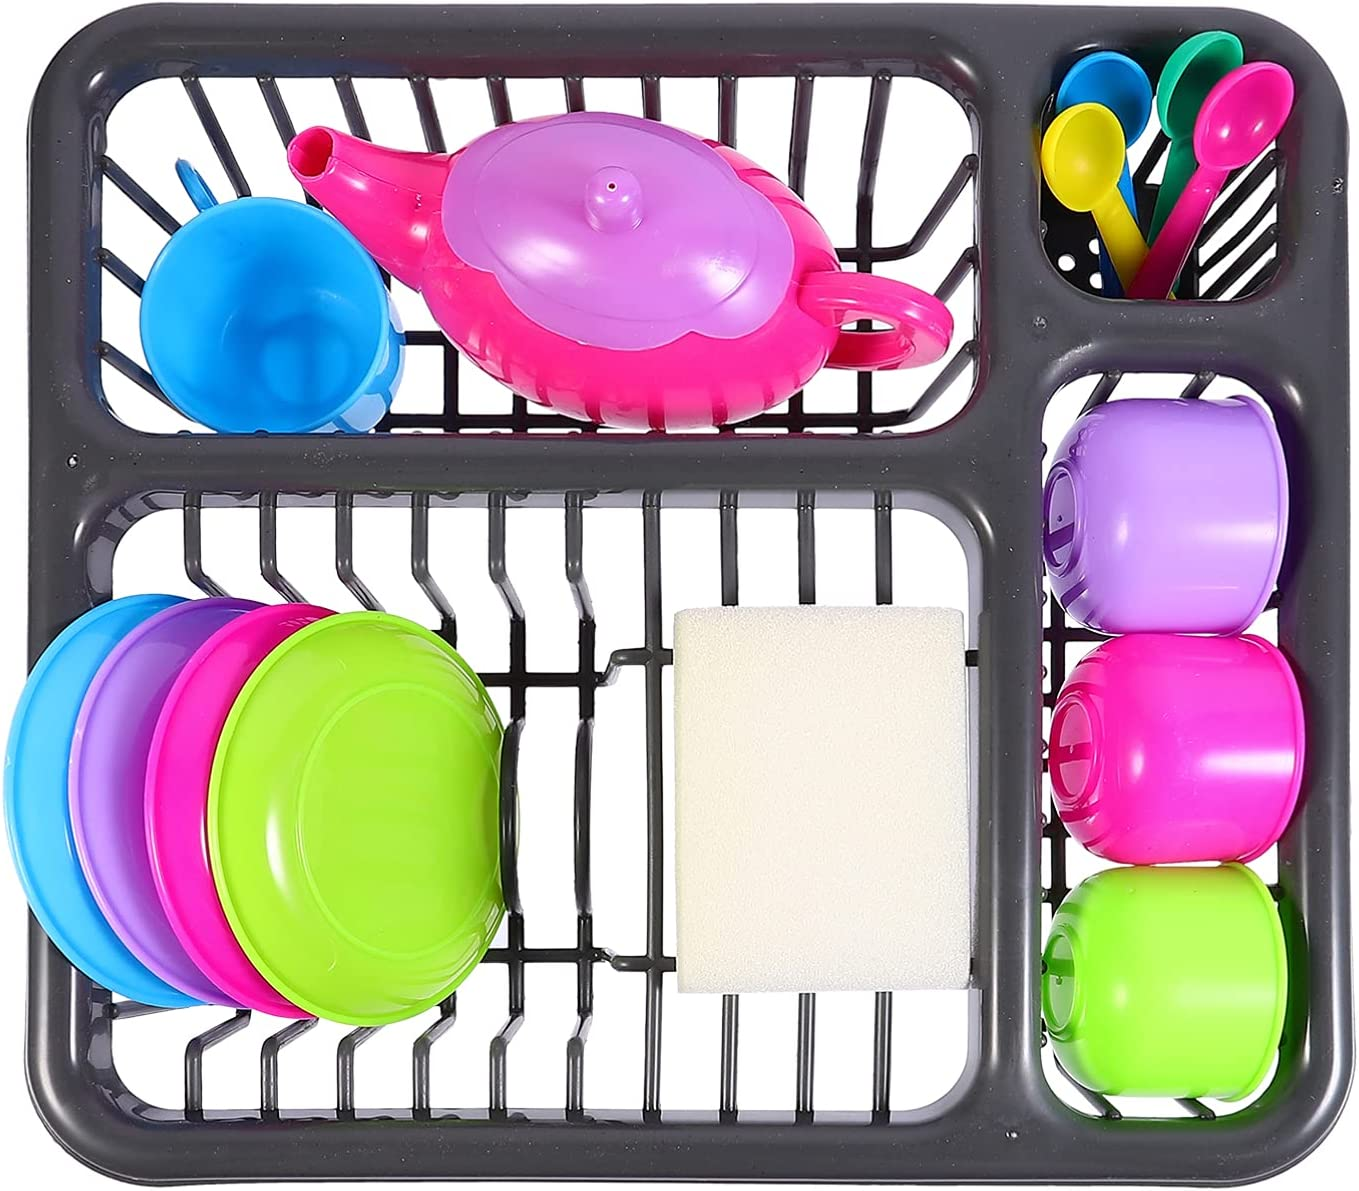 jojofuny Kitchen Sink Ranking TOP18 Bombing free shipping Toy 1 Set 15pcs Tableware Plastic Models K